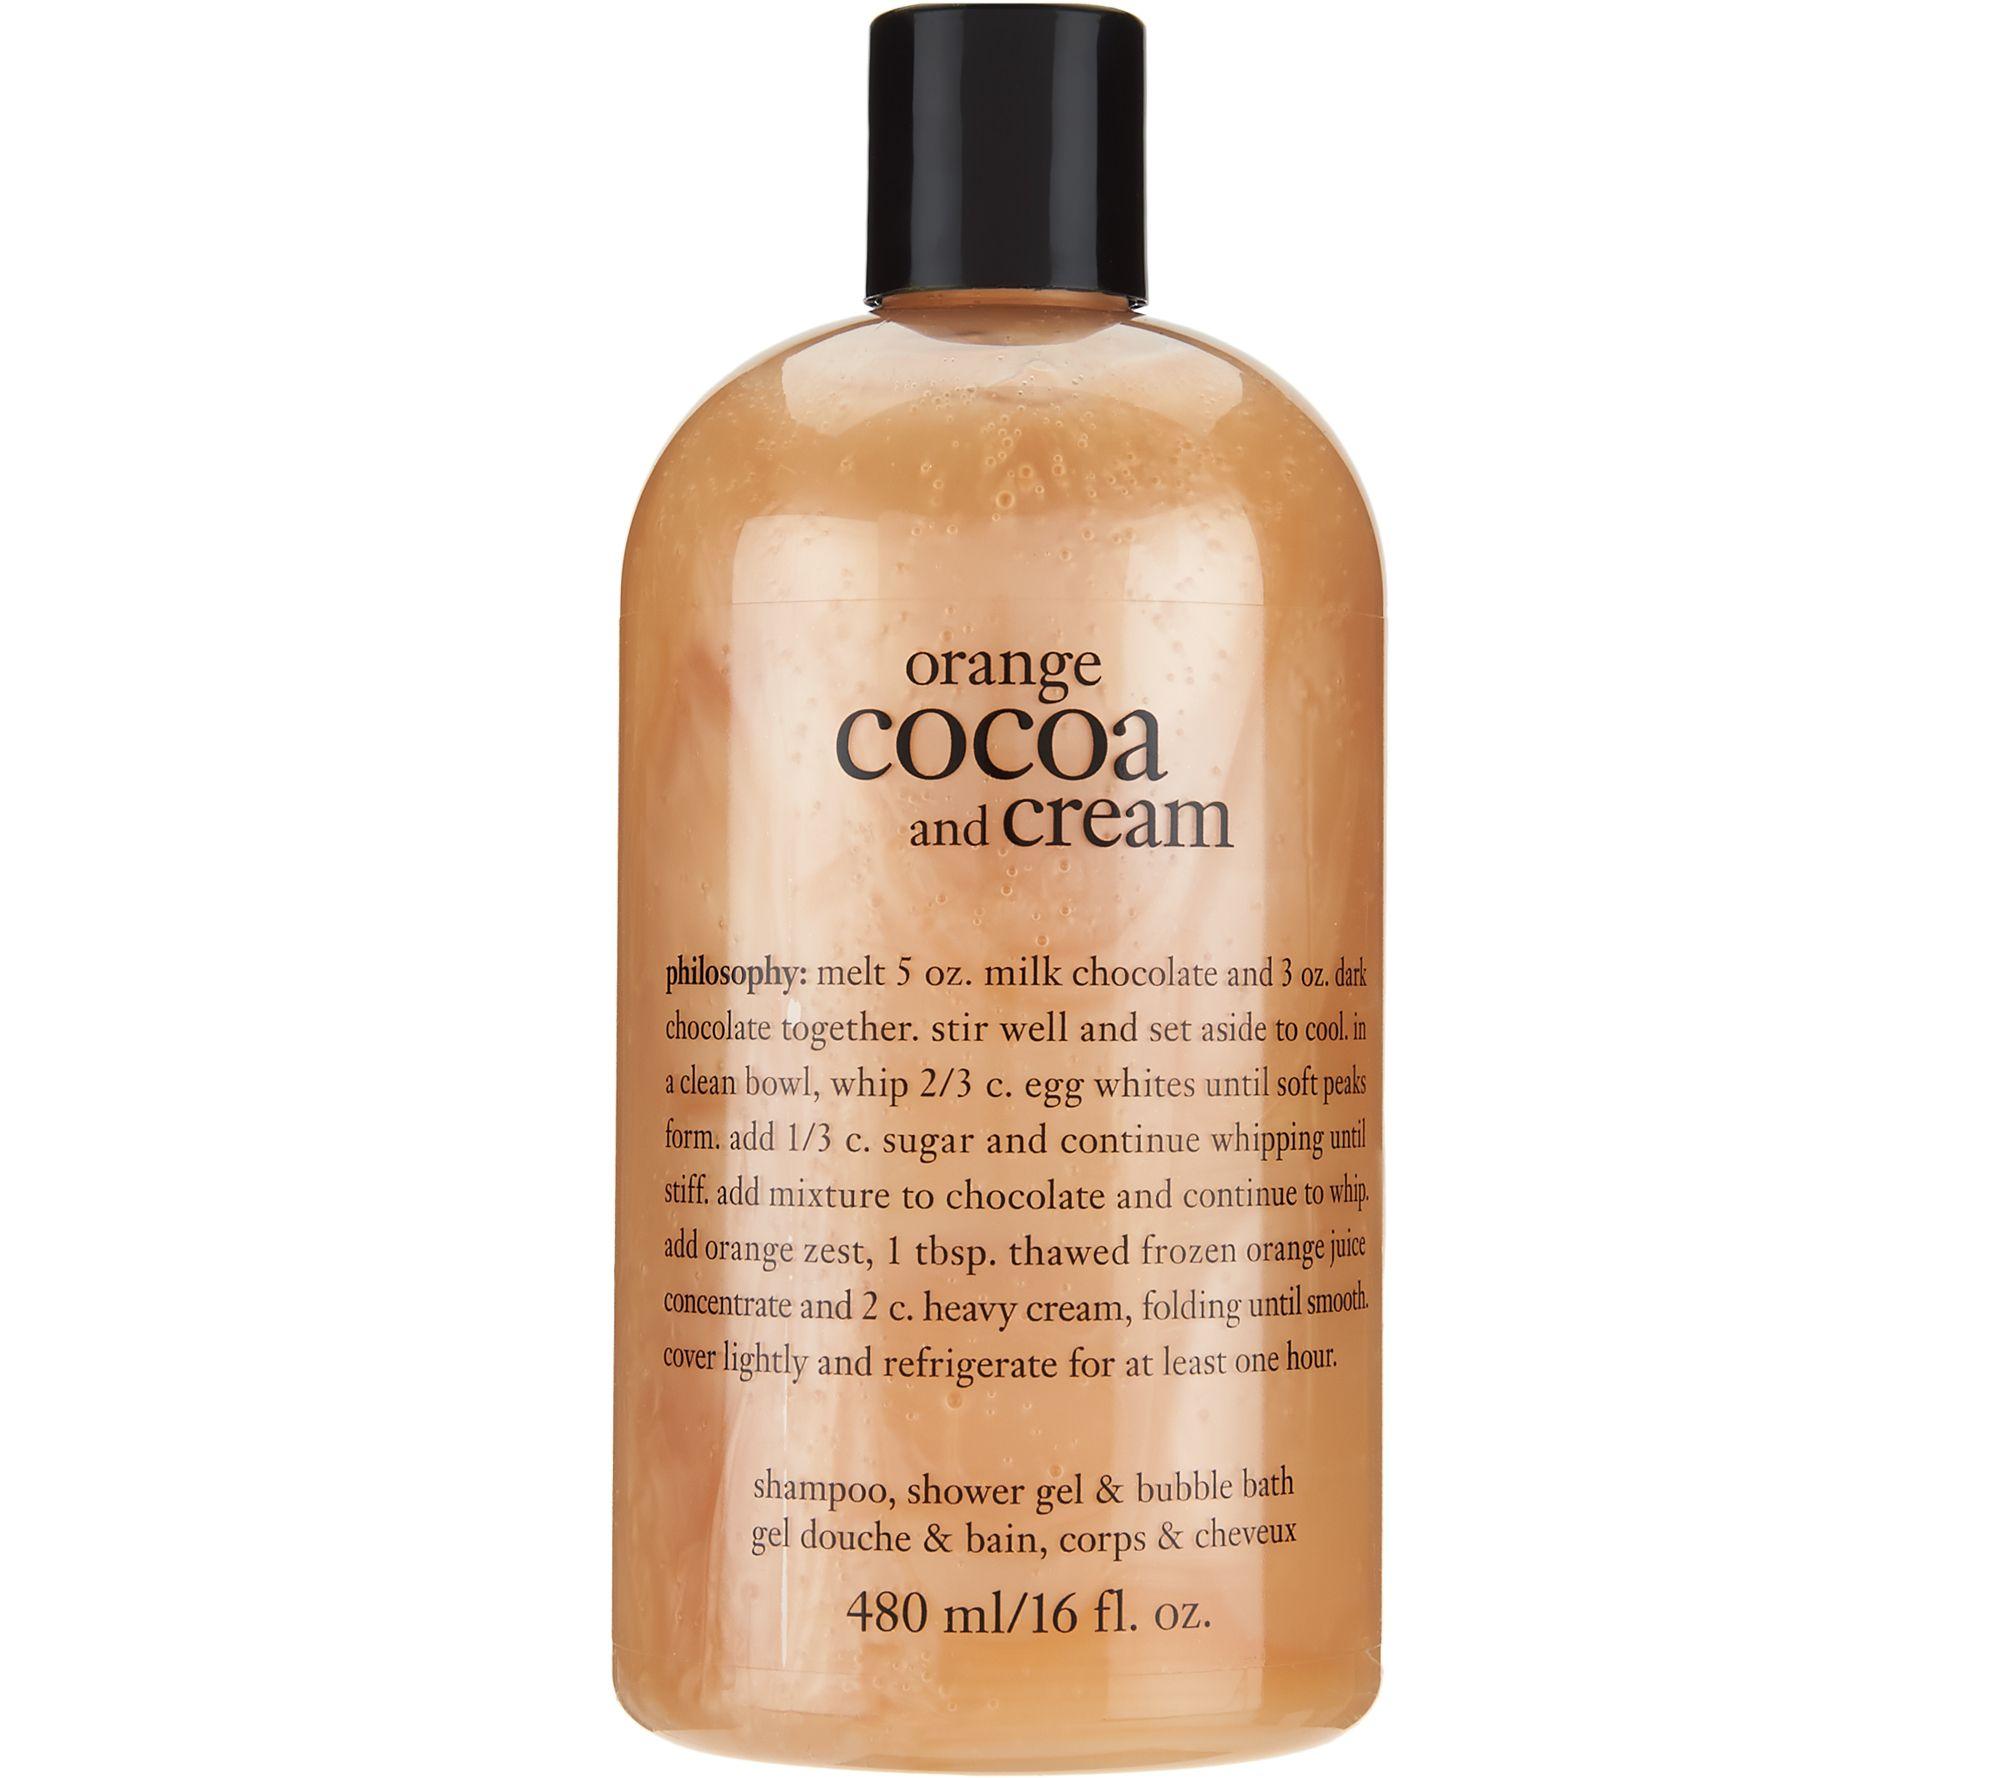 philosophy orange cocoa cream shower gel souffle duo page 1 philosophy orange cocoa cream shower gel souffle duo page 1 qvc com